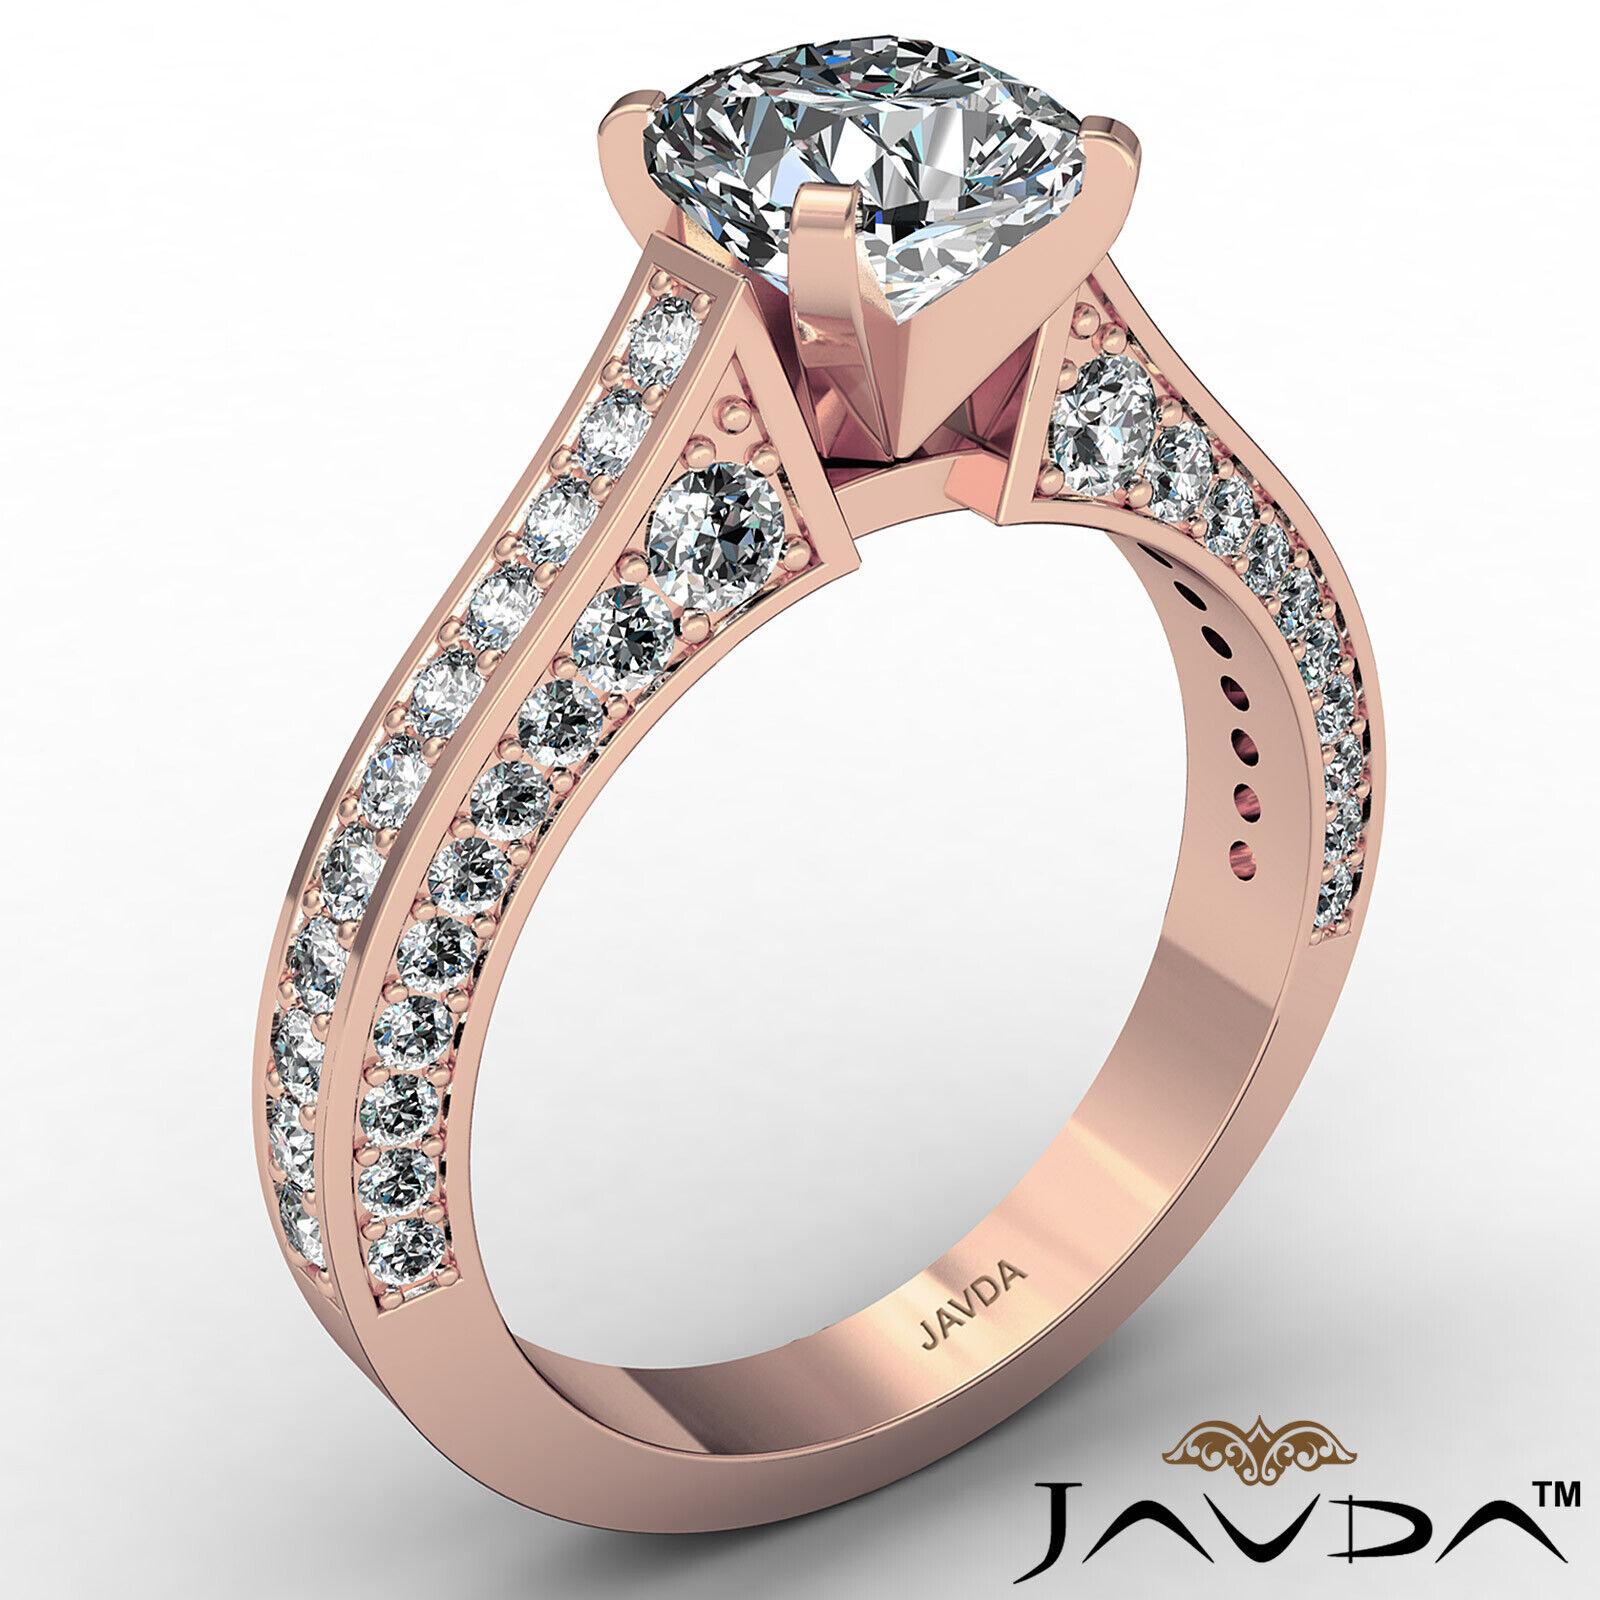 Cushion Diamond Engagement Pave Set Ring GIA J Color & VS2 clarity 1.82ctw 5